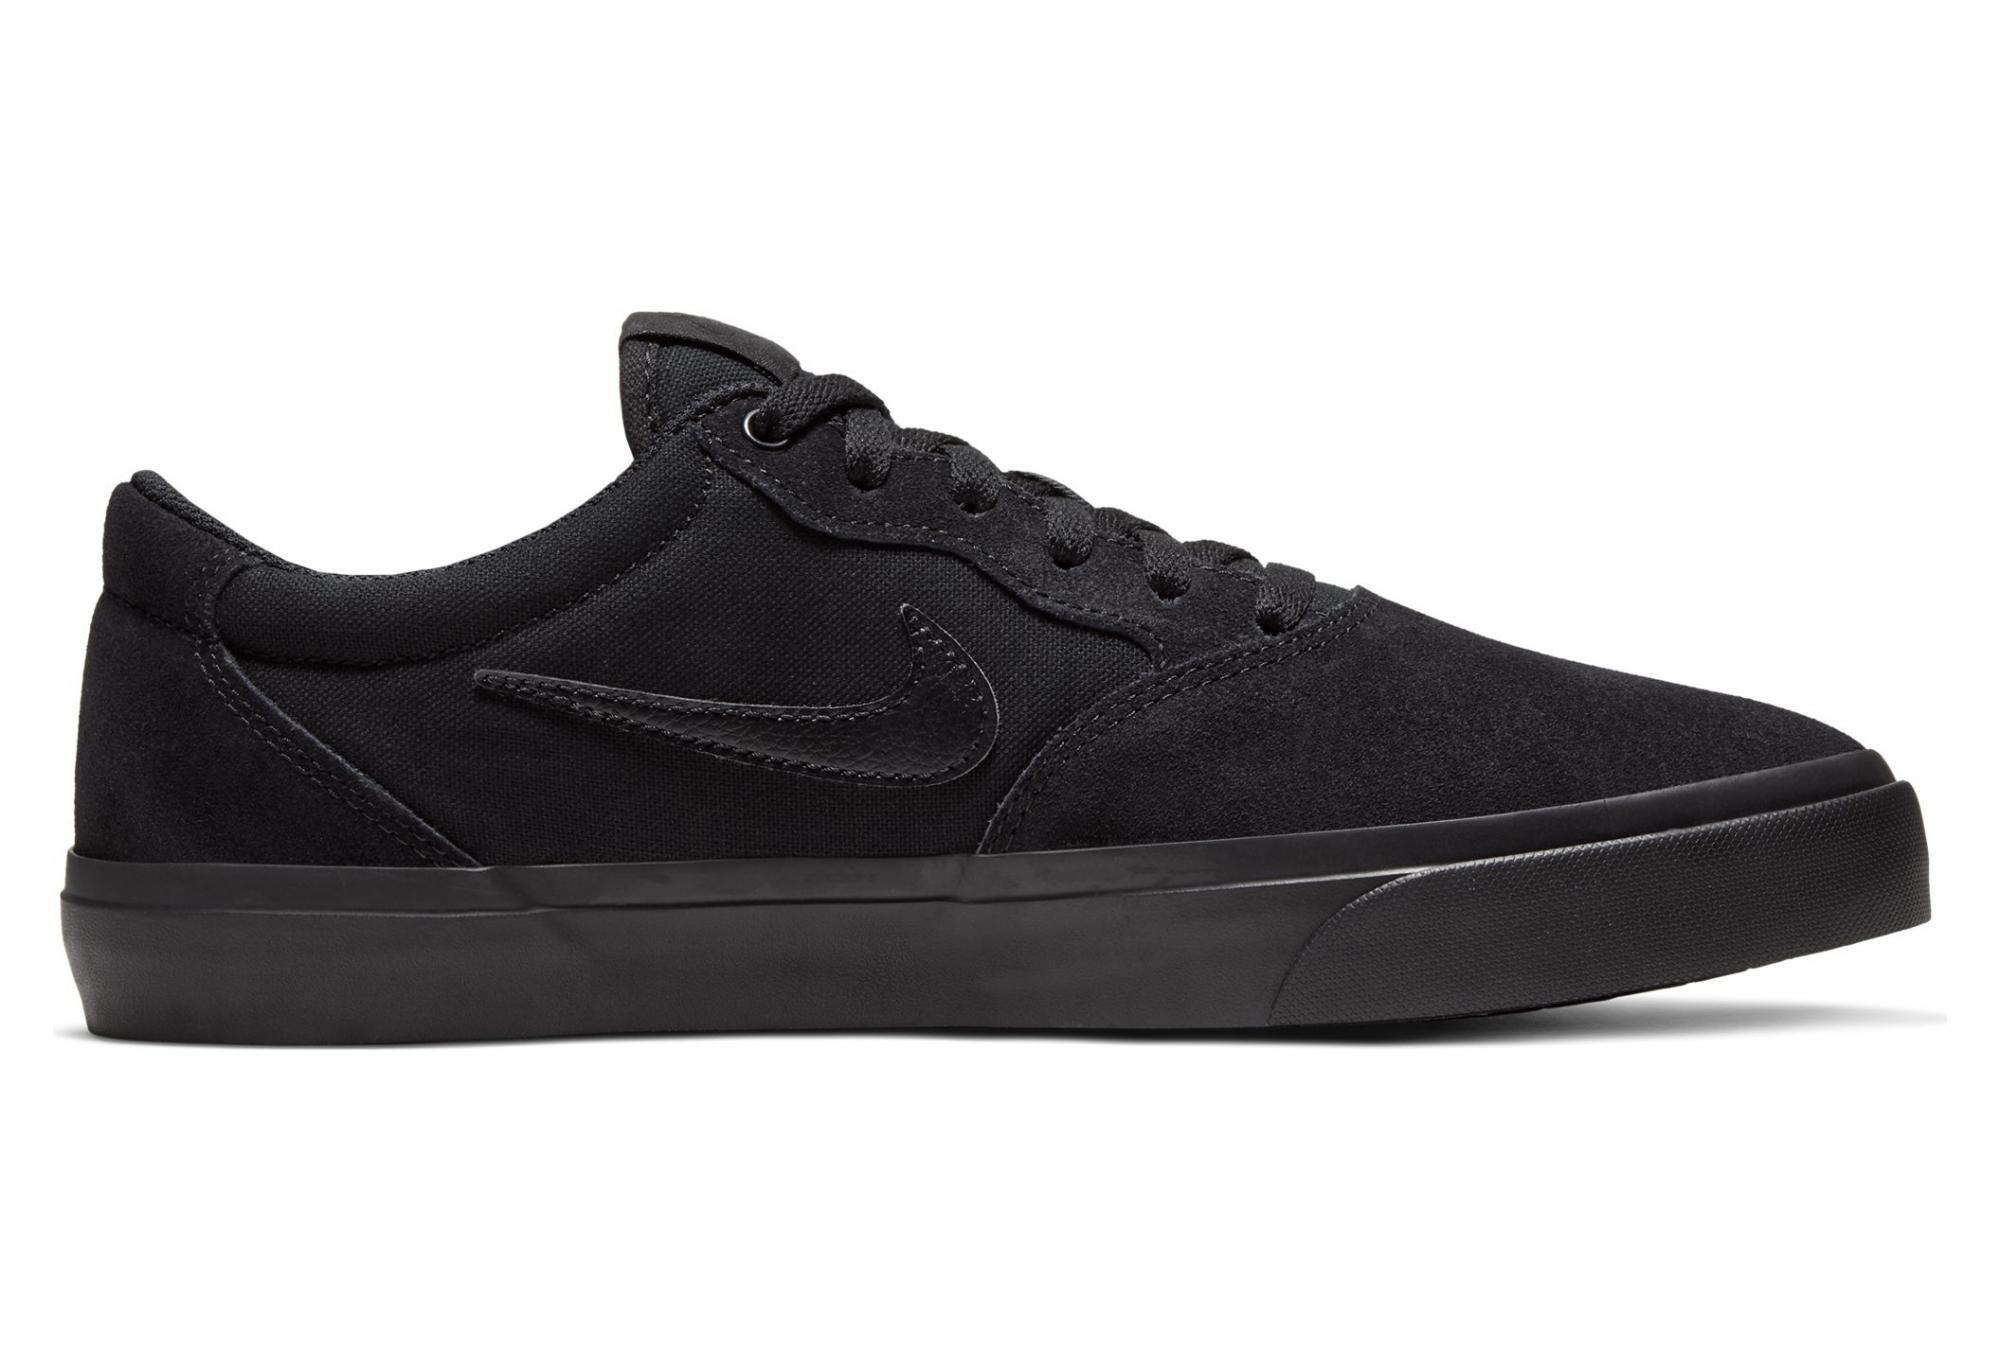 Nike SB Chron Solarsoft Black Shoes